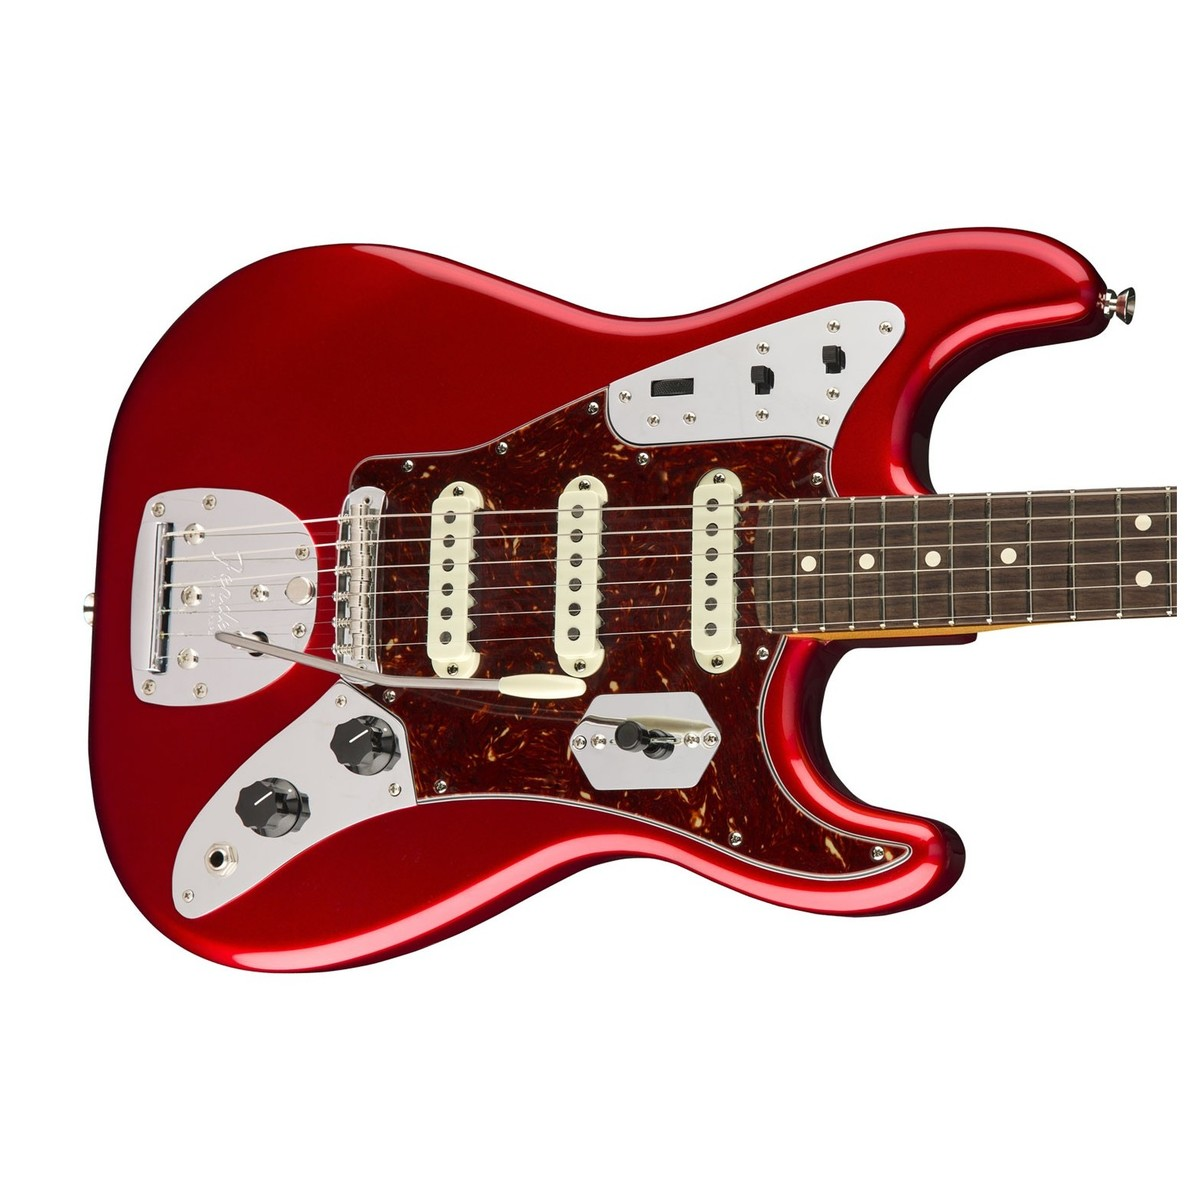 rare re one guitar jaguar cbs owner true inventory custom fender vintage black color we ll confident love this you pre